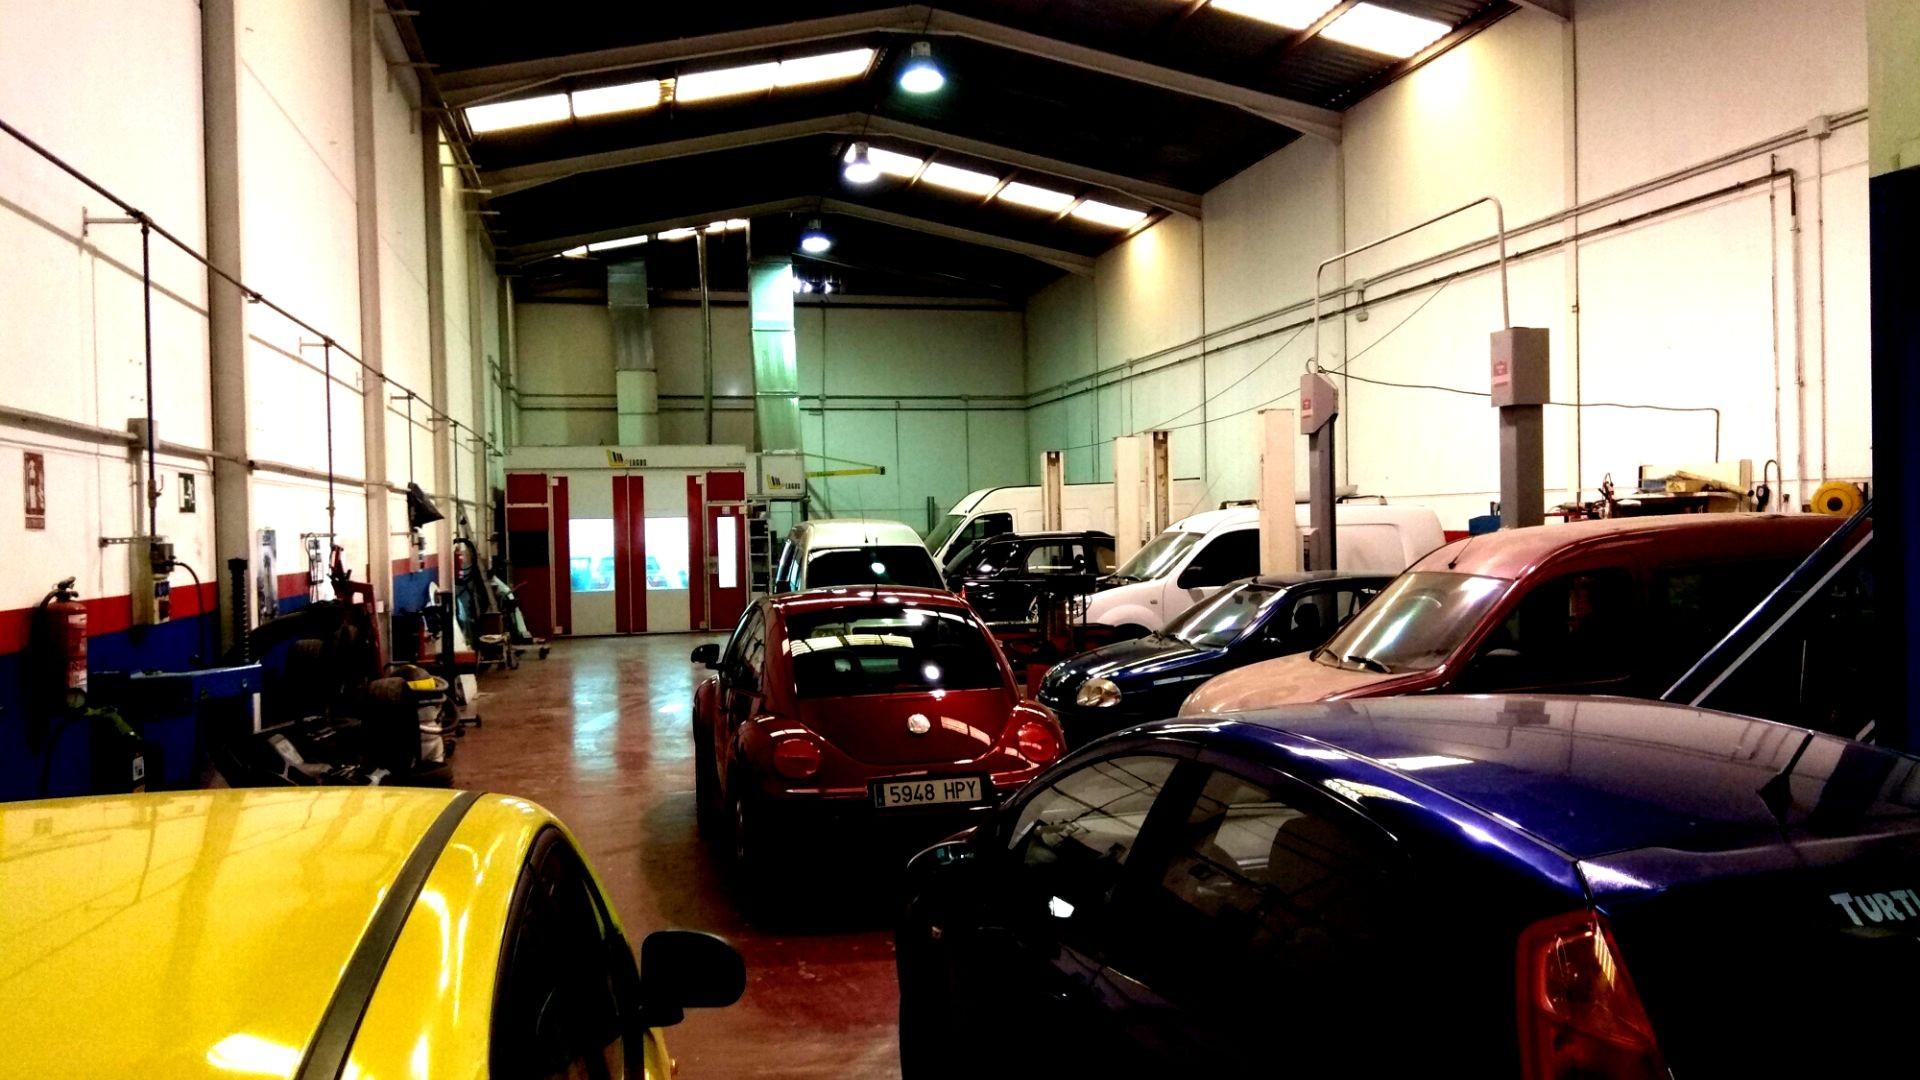 Taller de reparación de coches san vicente del raspeig